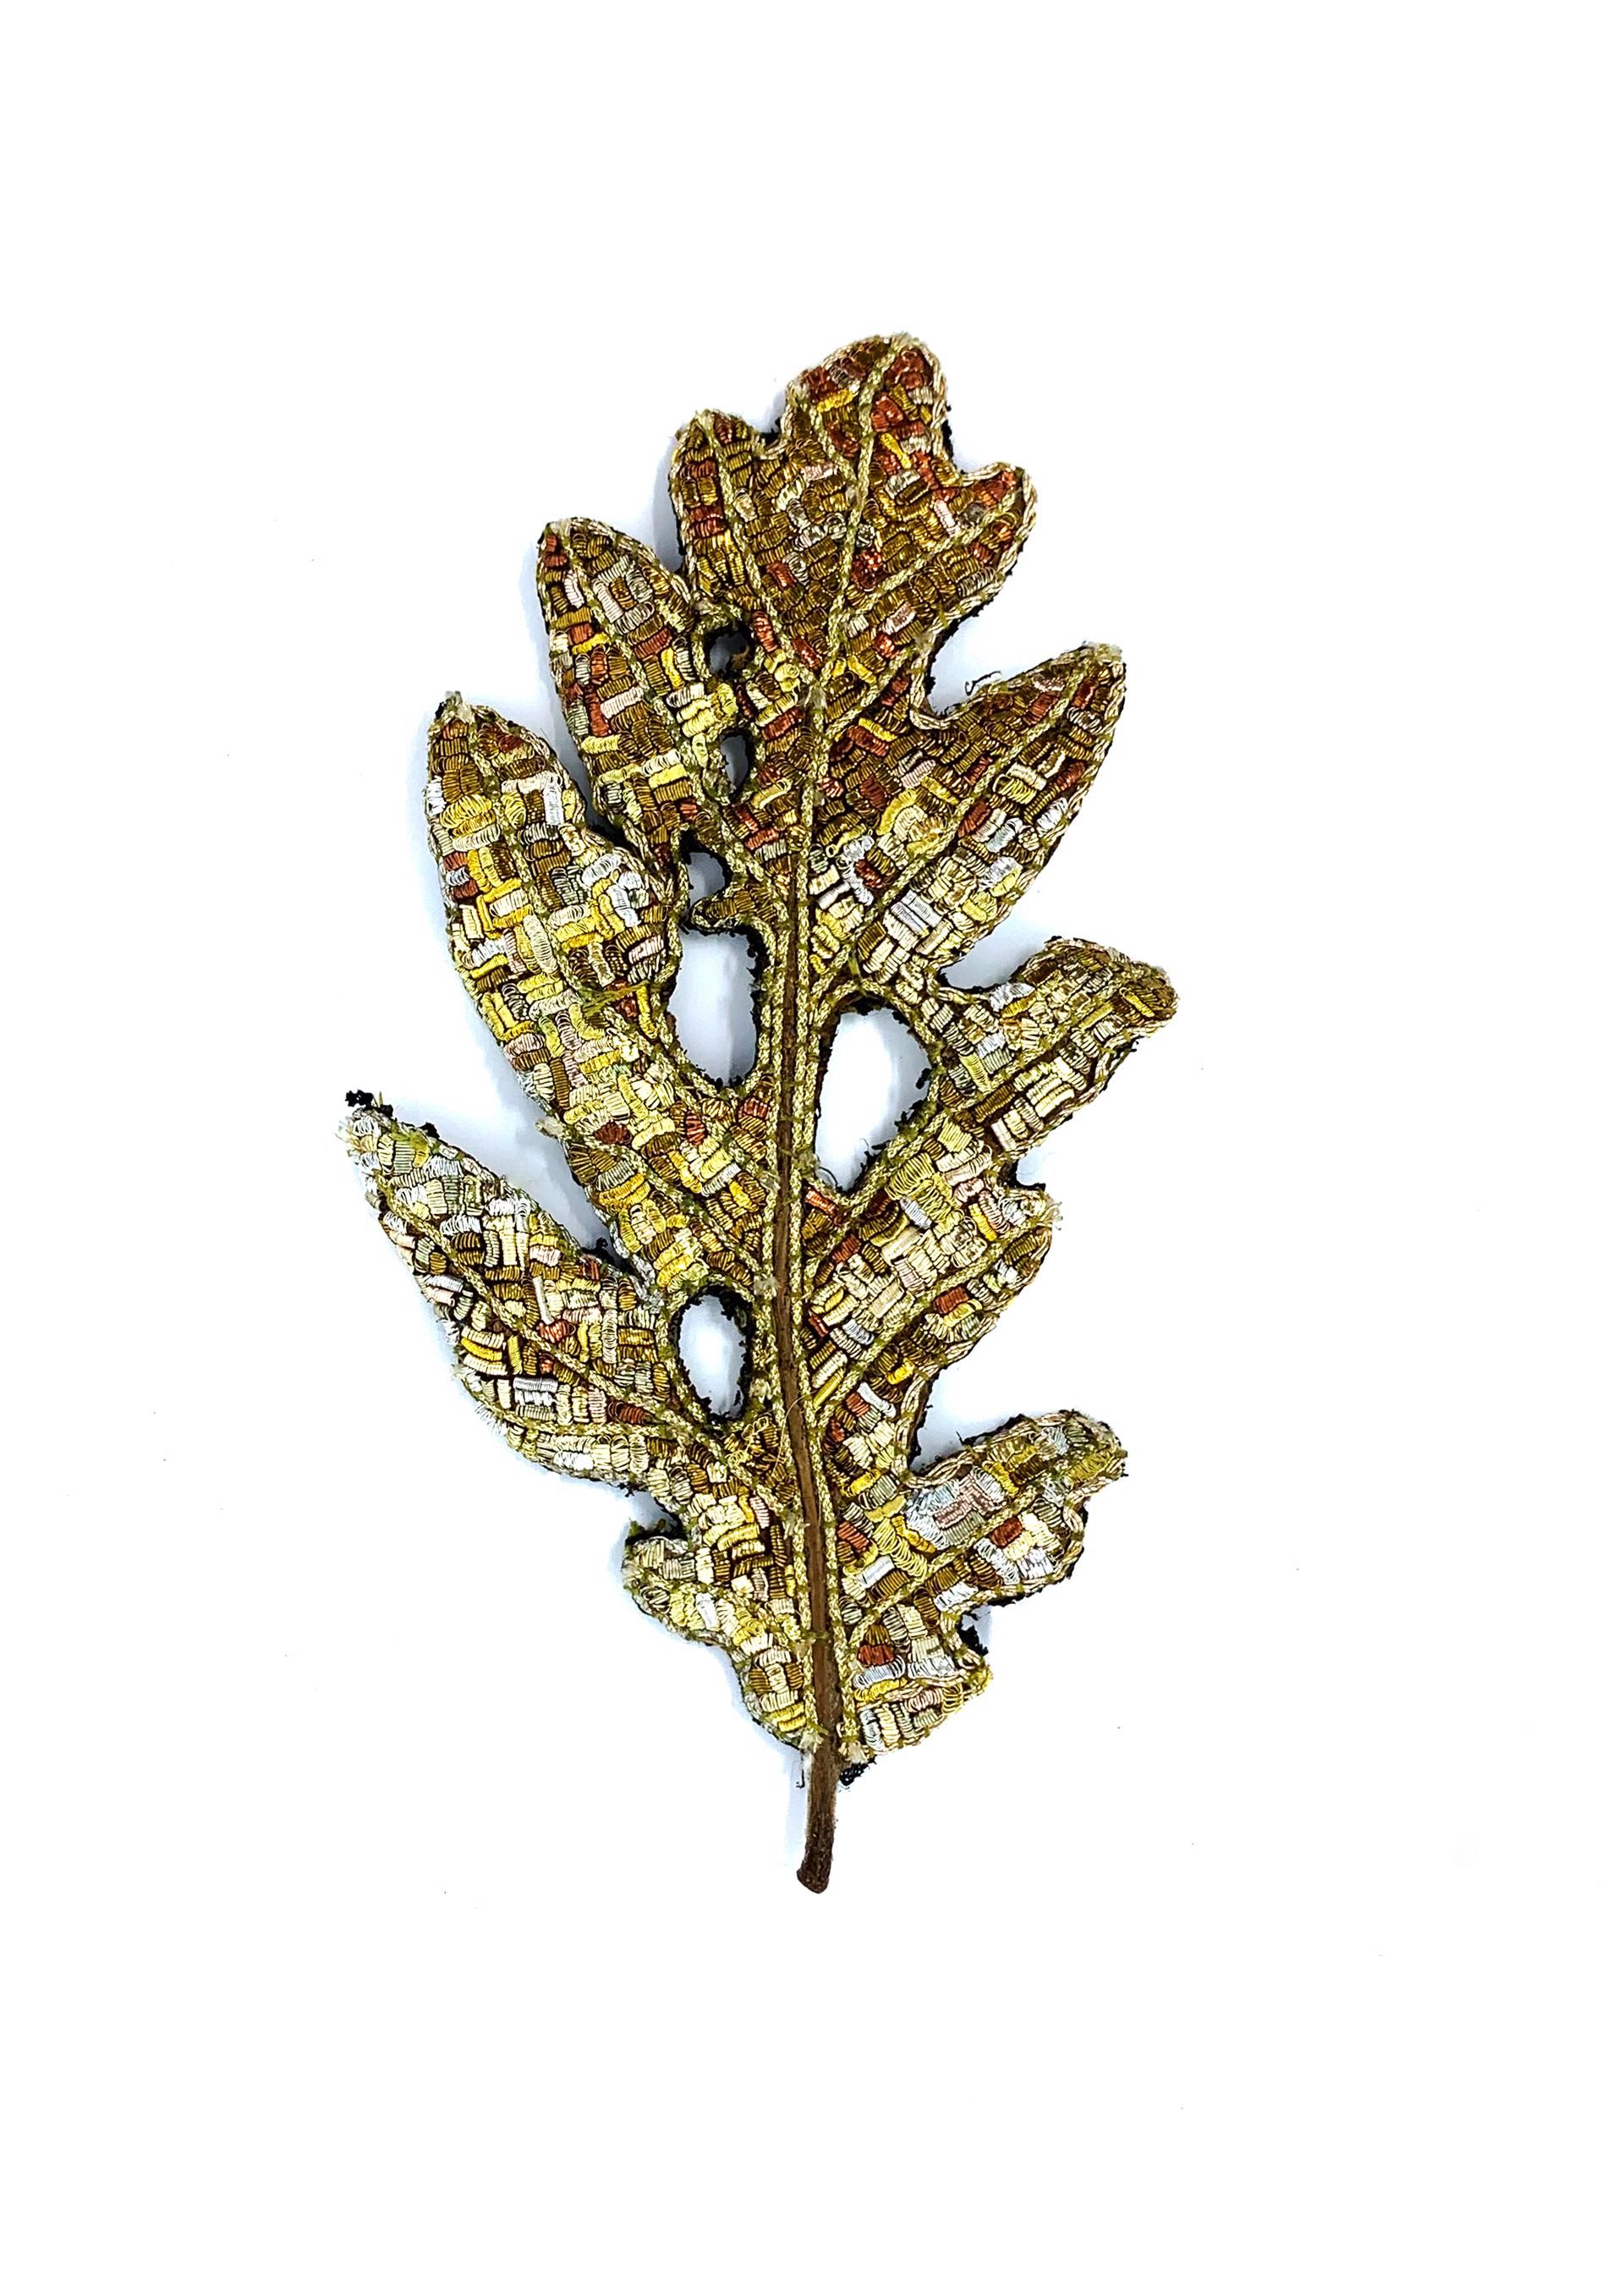 The Impermanence of Life: Oak Leaf V by Tiao Nithakhong Somsanith